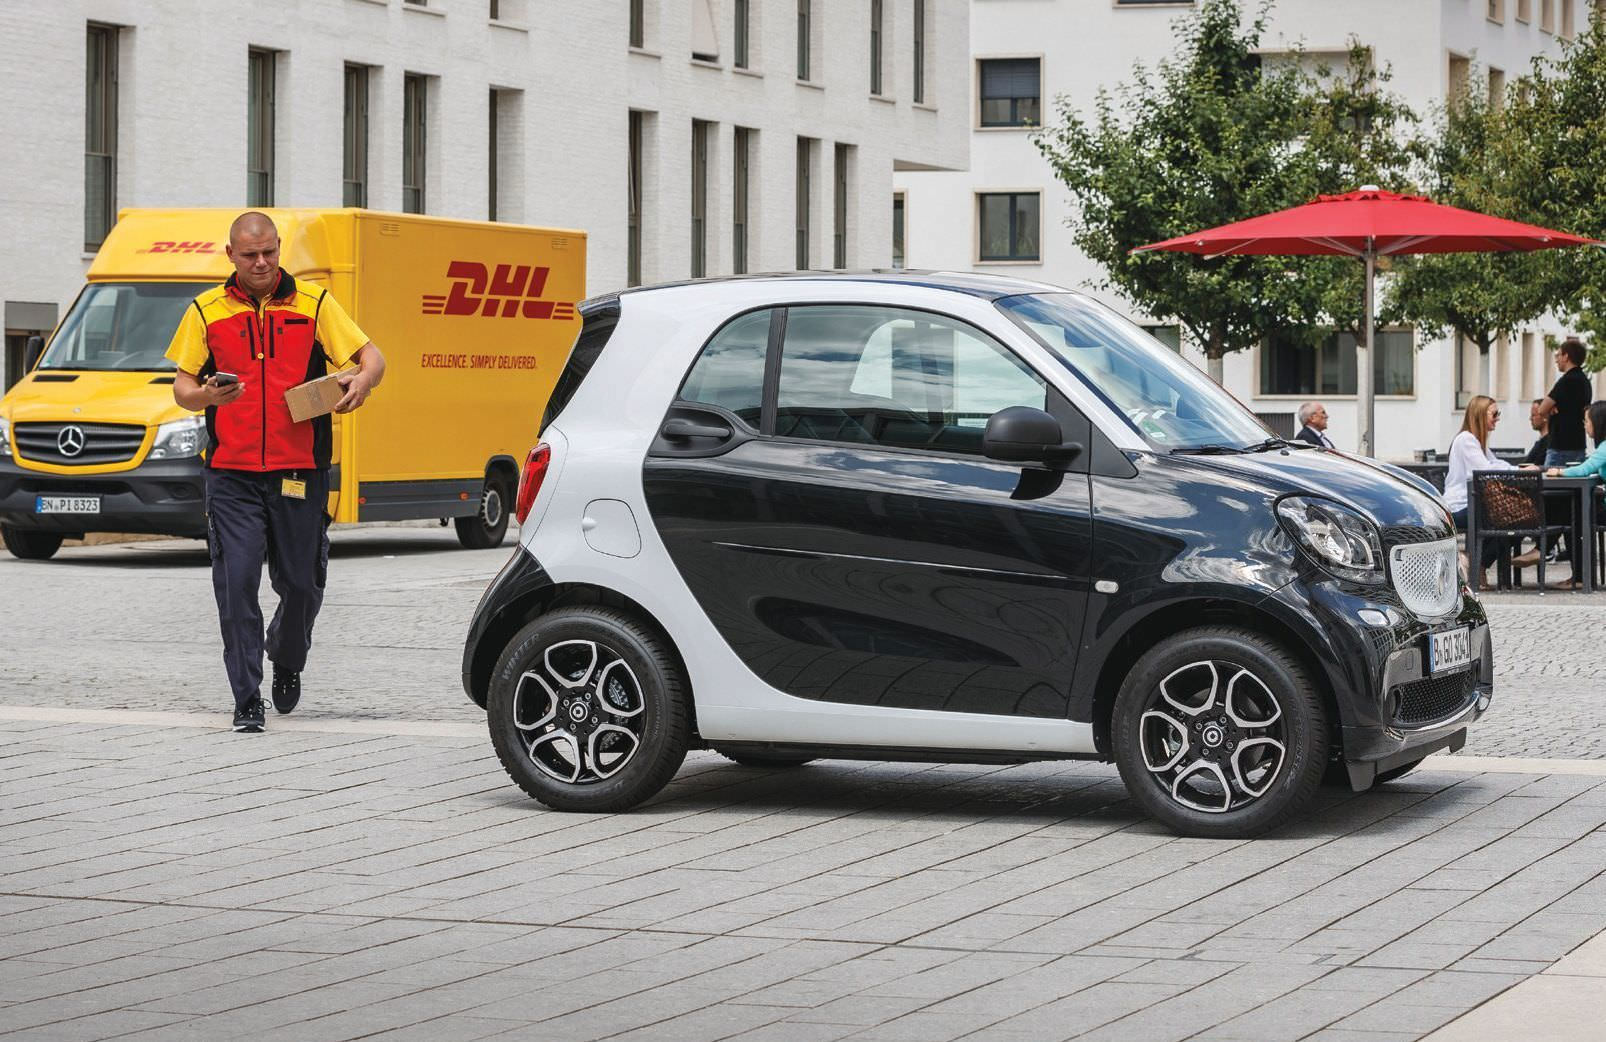 dhl now delivers parcels to smart car trunks